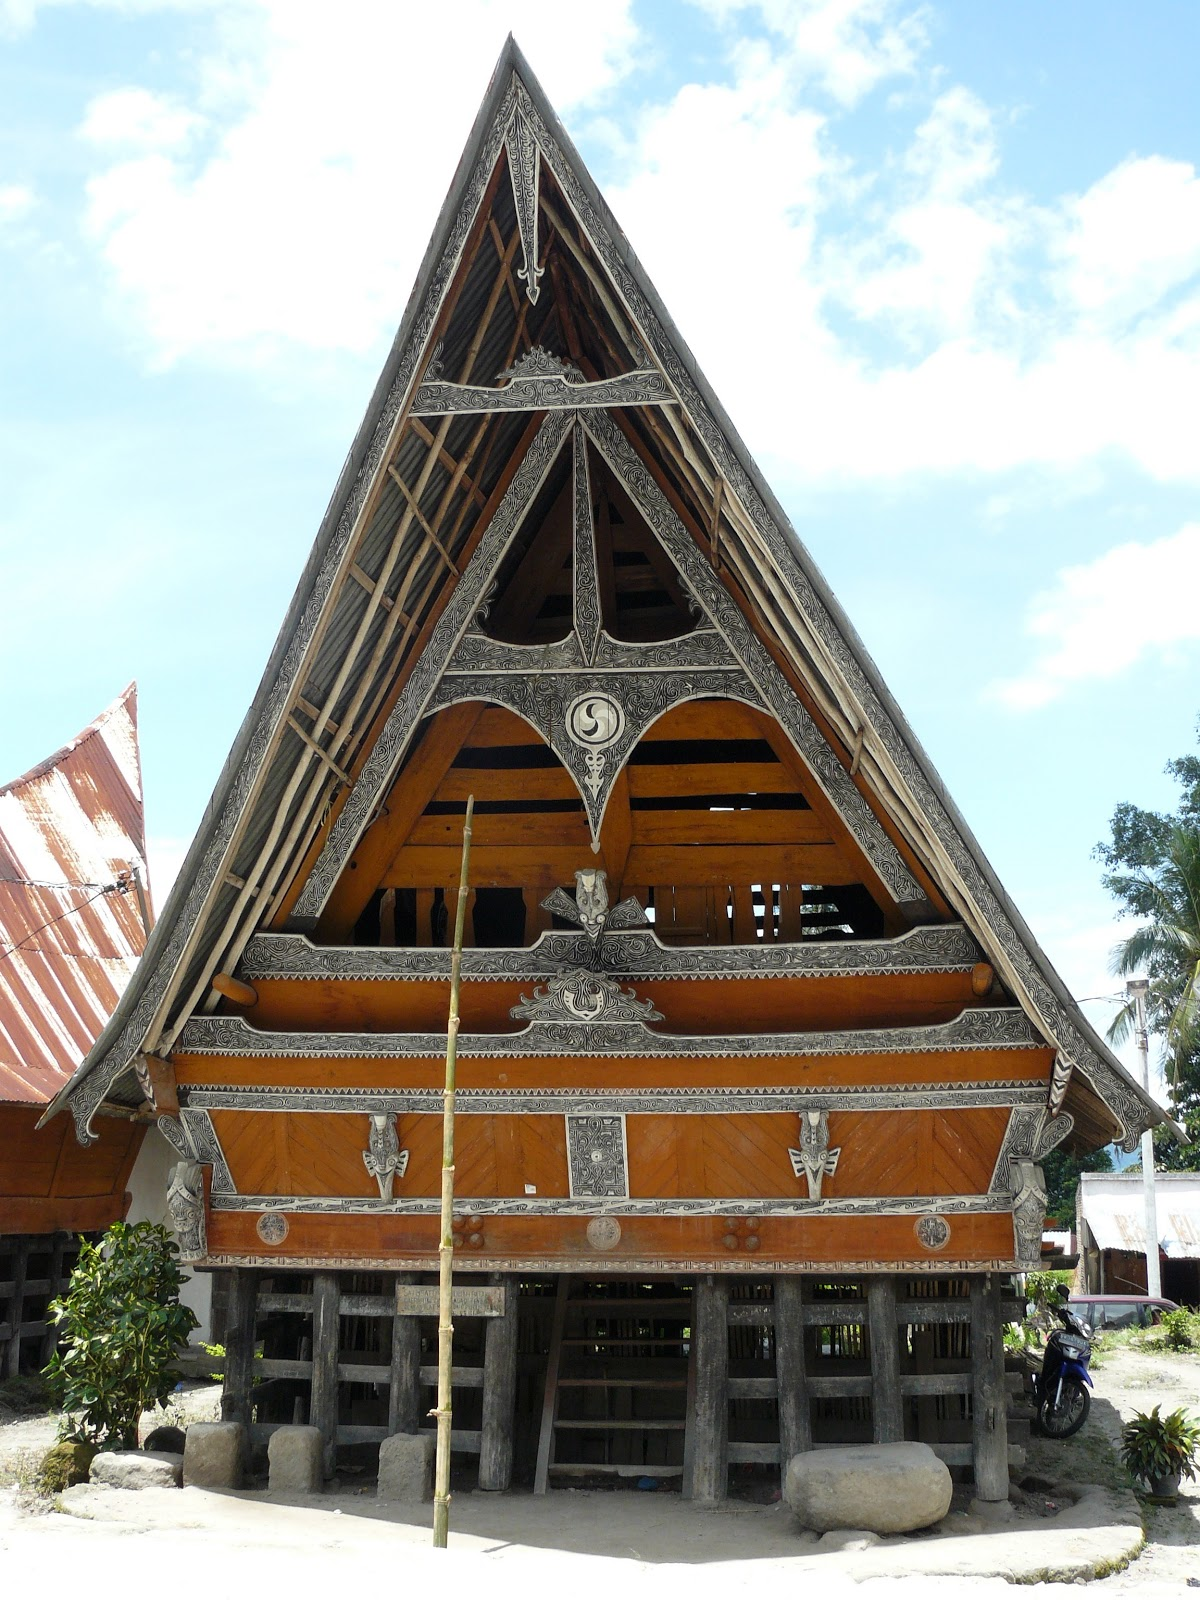 Wisata Desa Tomok Dan Desa Ambarita Sumatera Utara Gido Interior